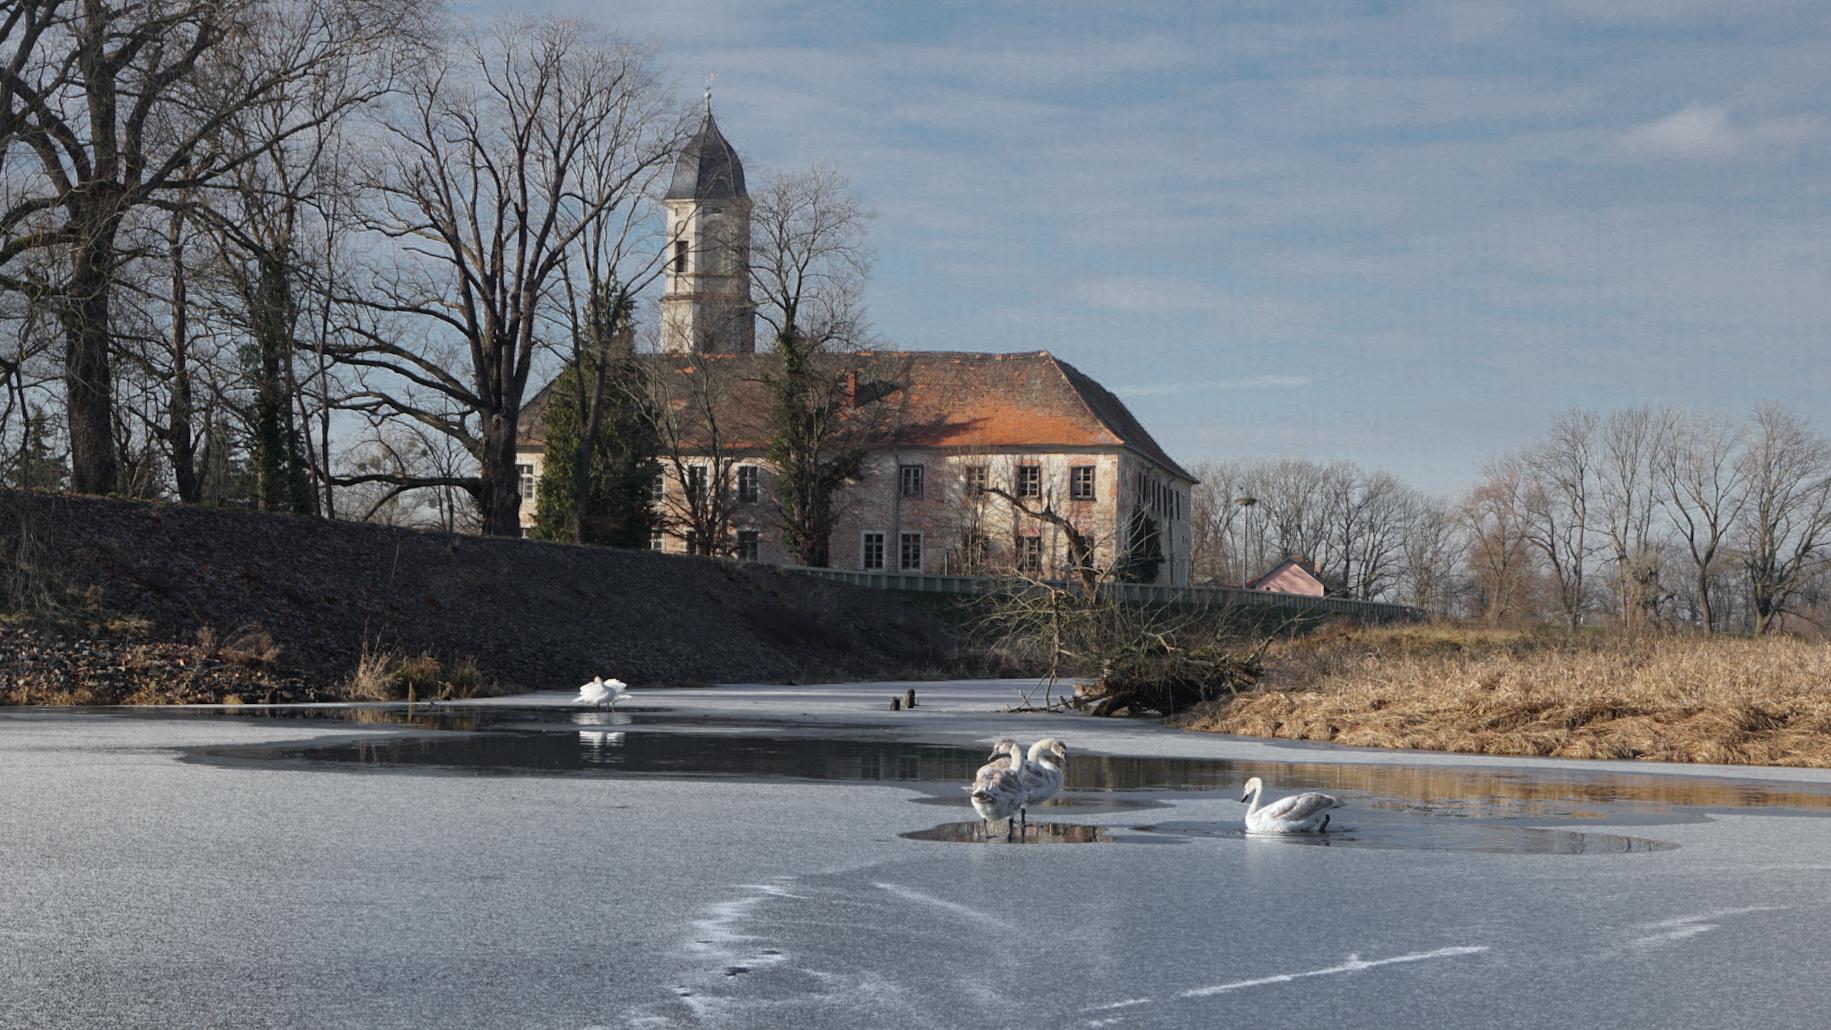 Wasserschloss Hemsendorf in Winter, Germany